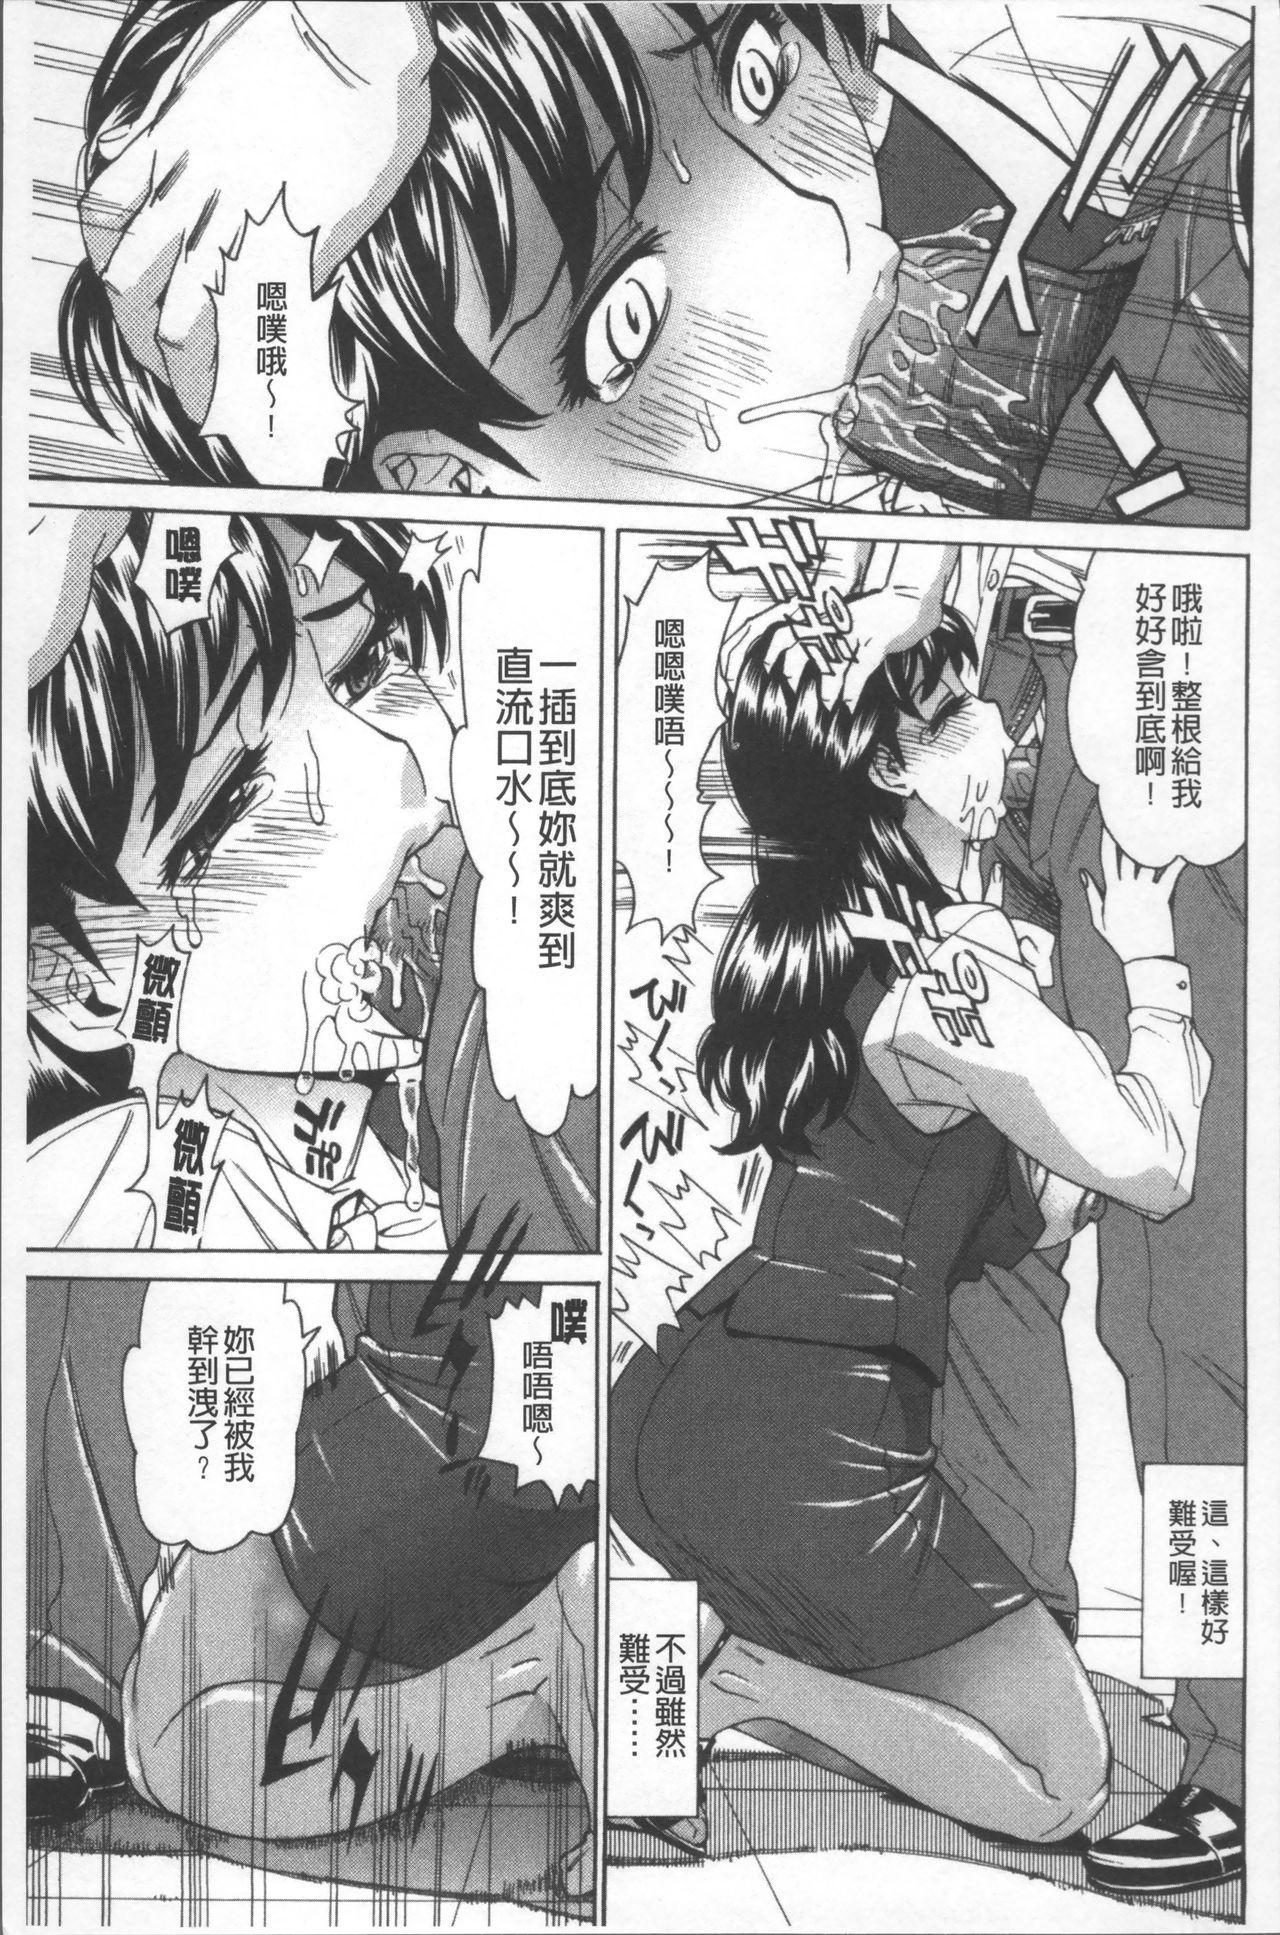 Hitozuma Kanshasai - SUPER EROTIC WIFE'S FESTIVAL 170